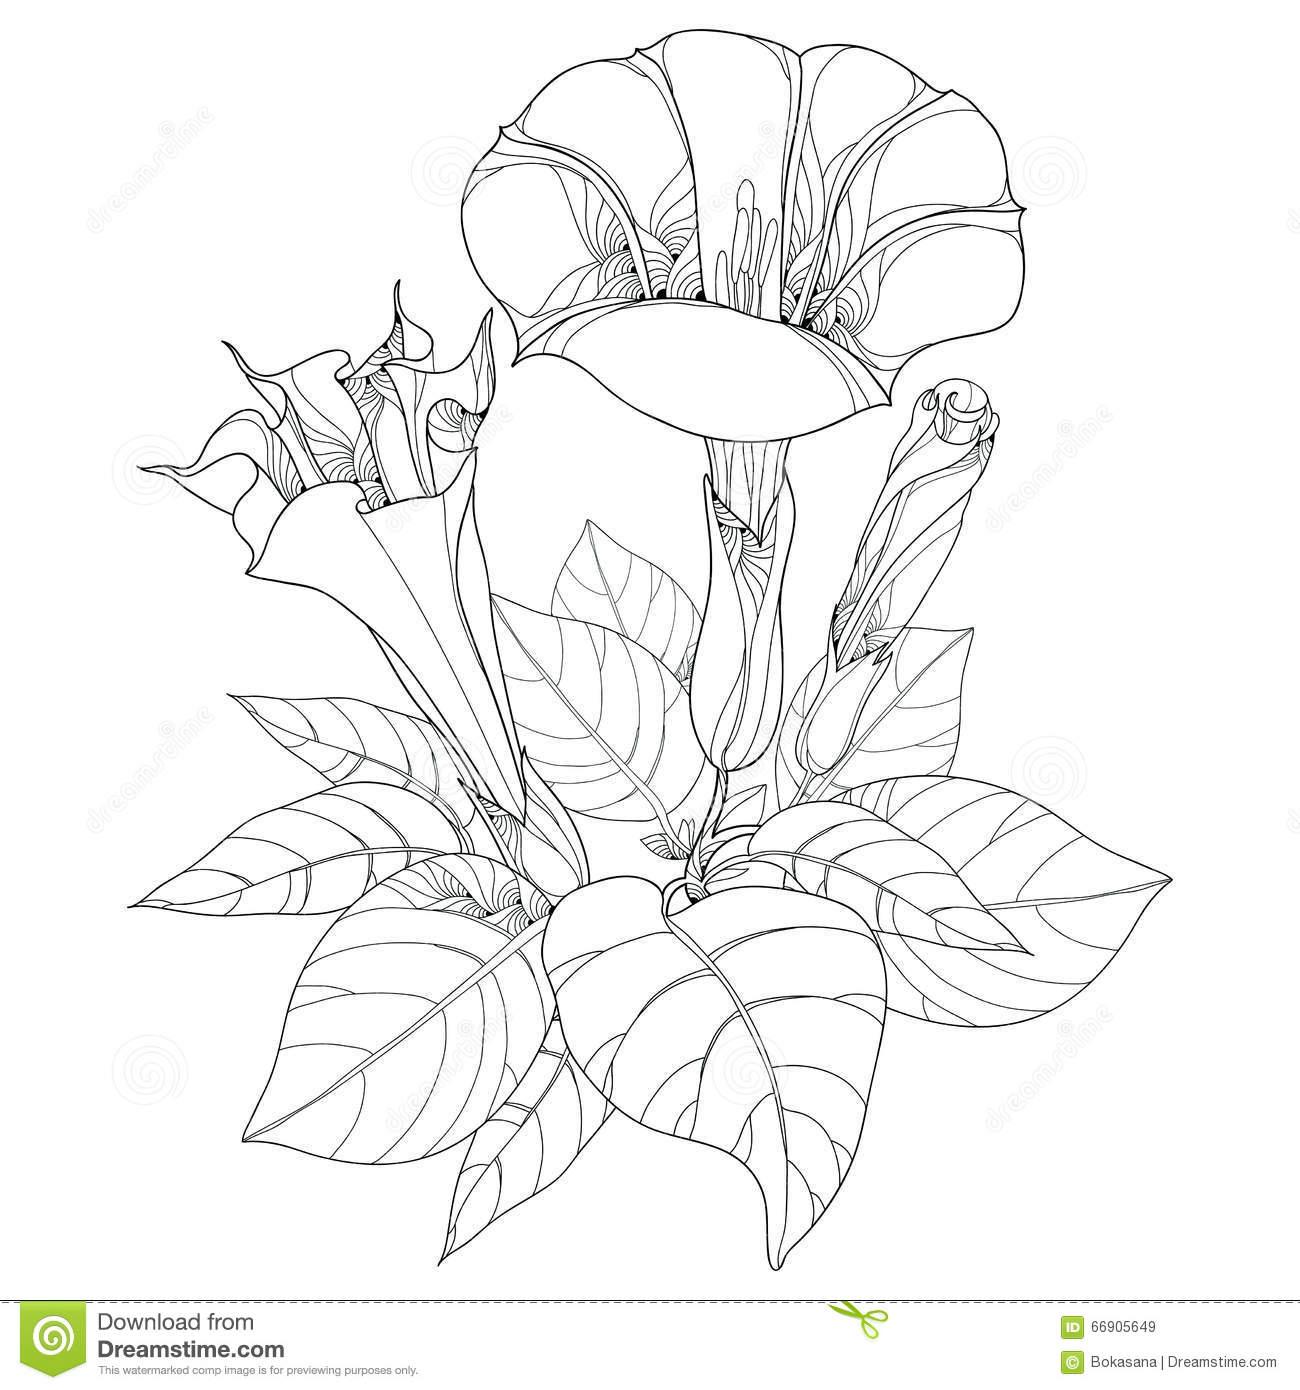 Stem With Datura Stramonium Or Thorn Apple. Poisonous Plant.